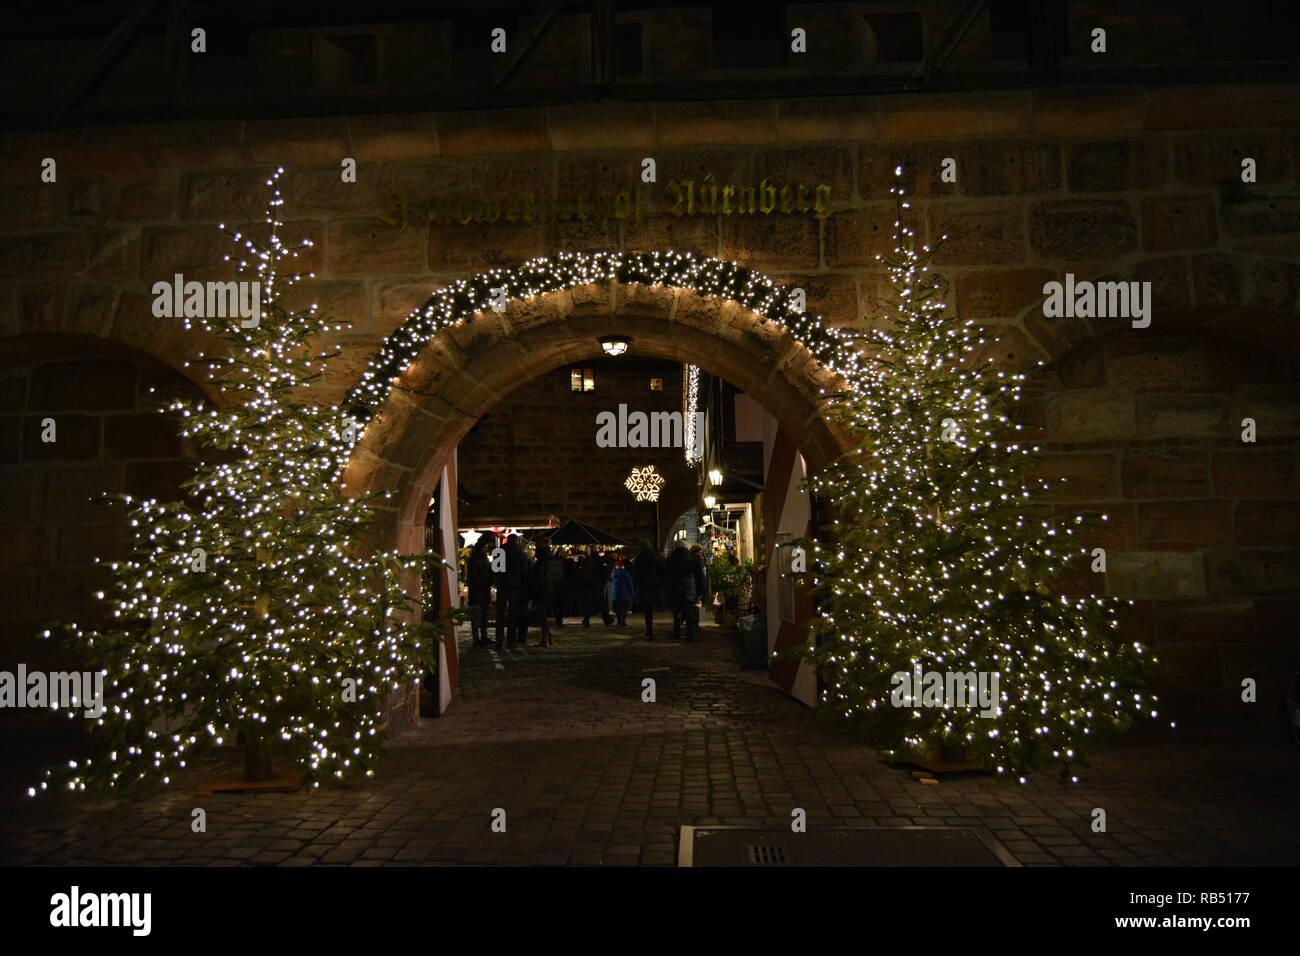 The amazing Christmas markets of Nuremberg, Germany. Night view. - Stock Image